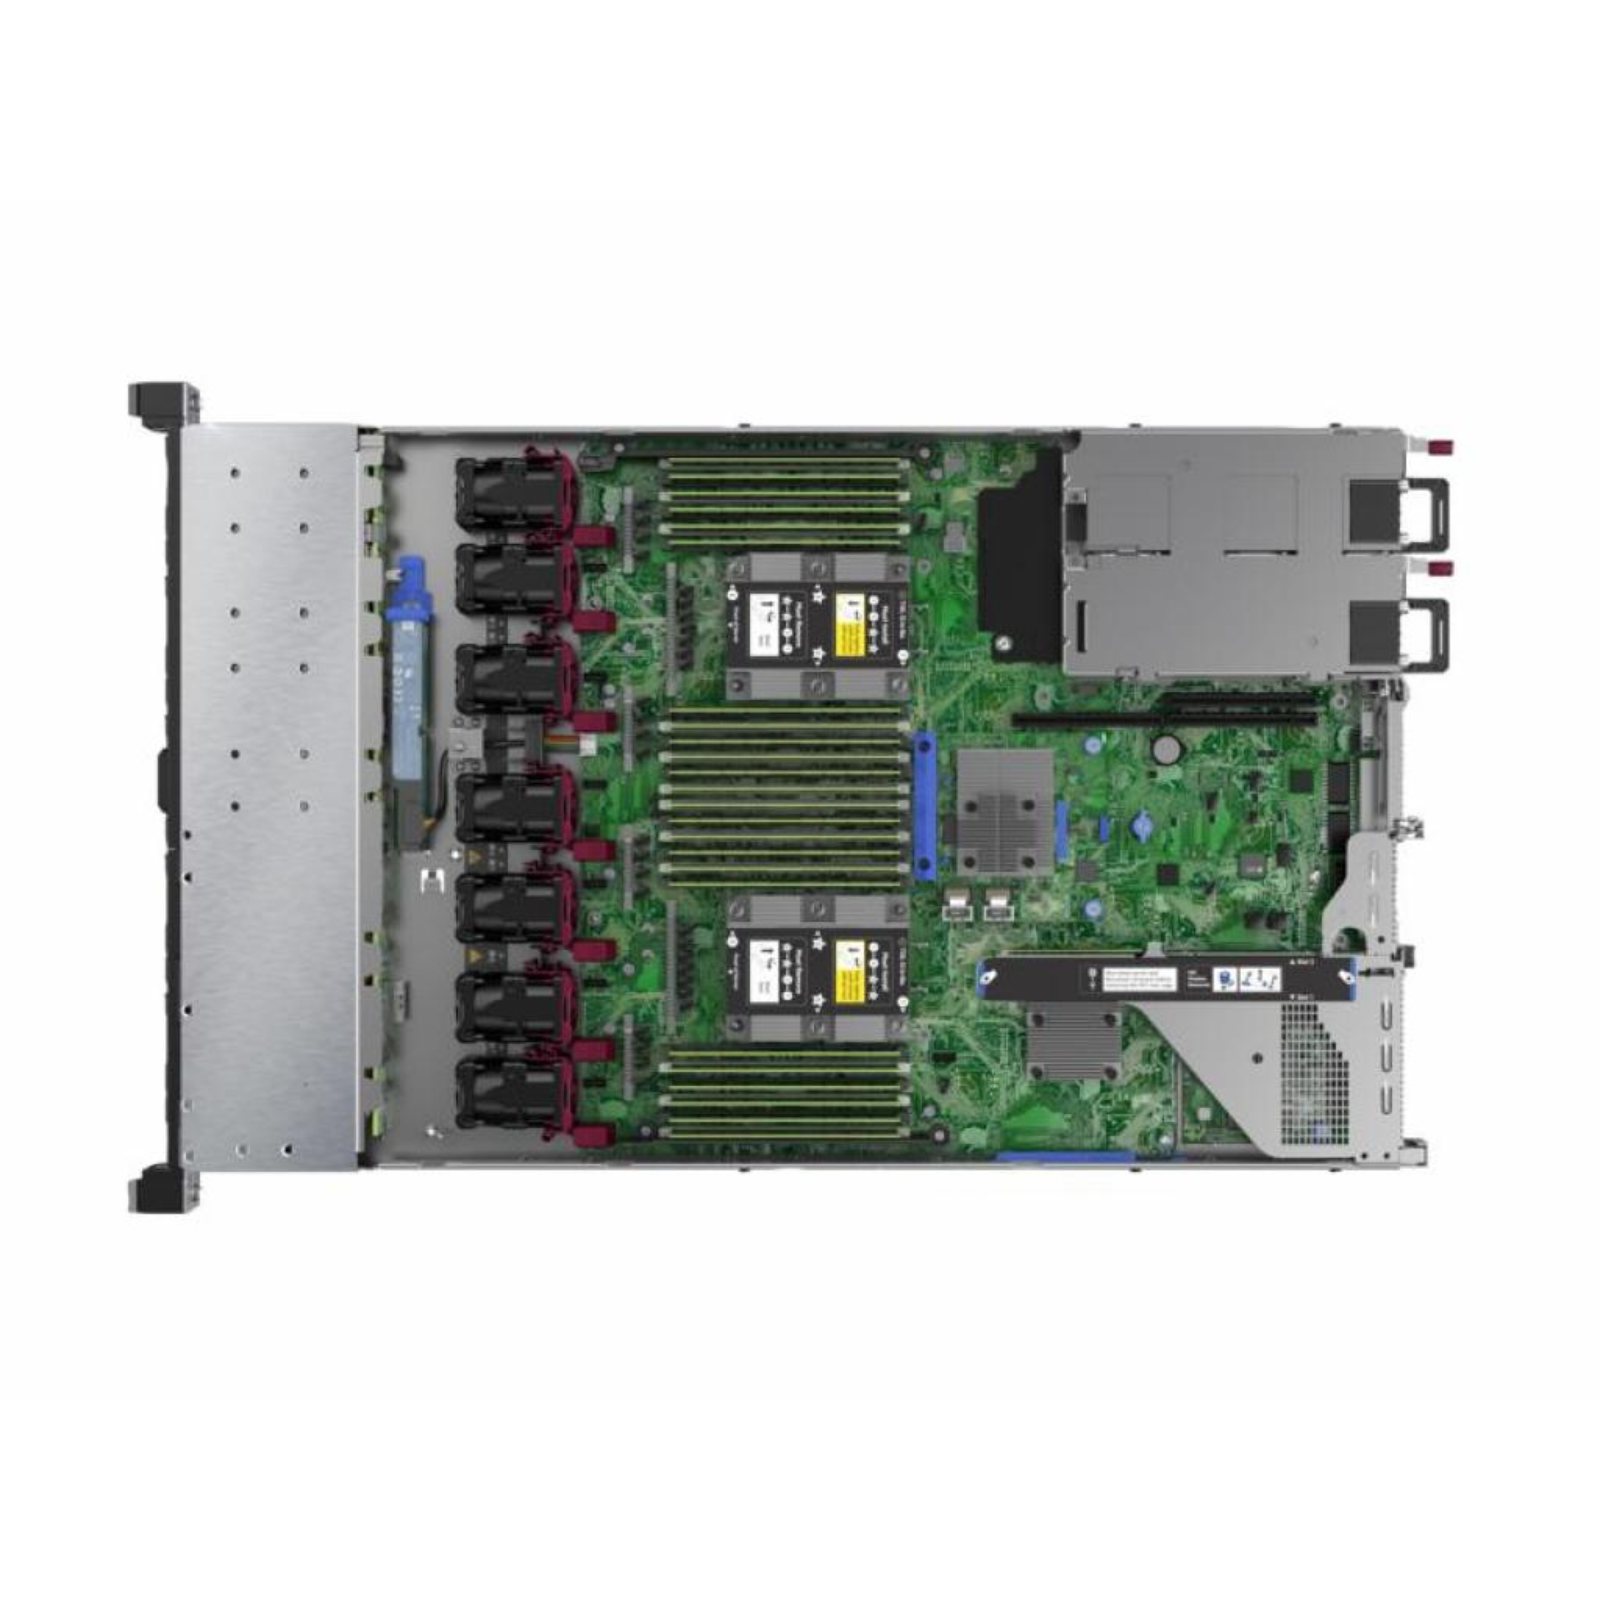 Сервер Hewlett Packard Enterprise P03632-B21 изображение 4